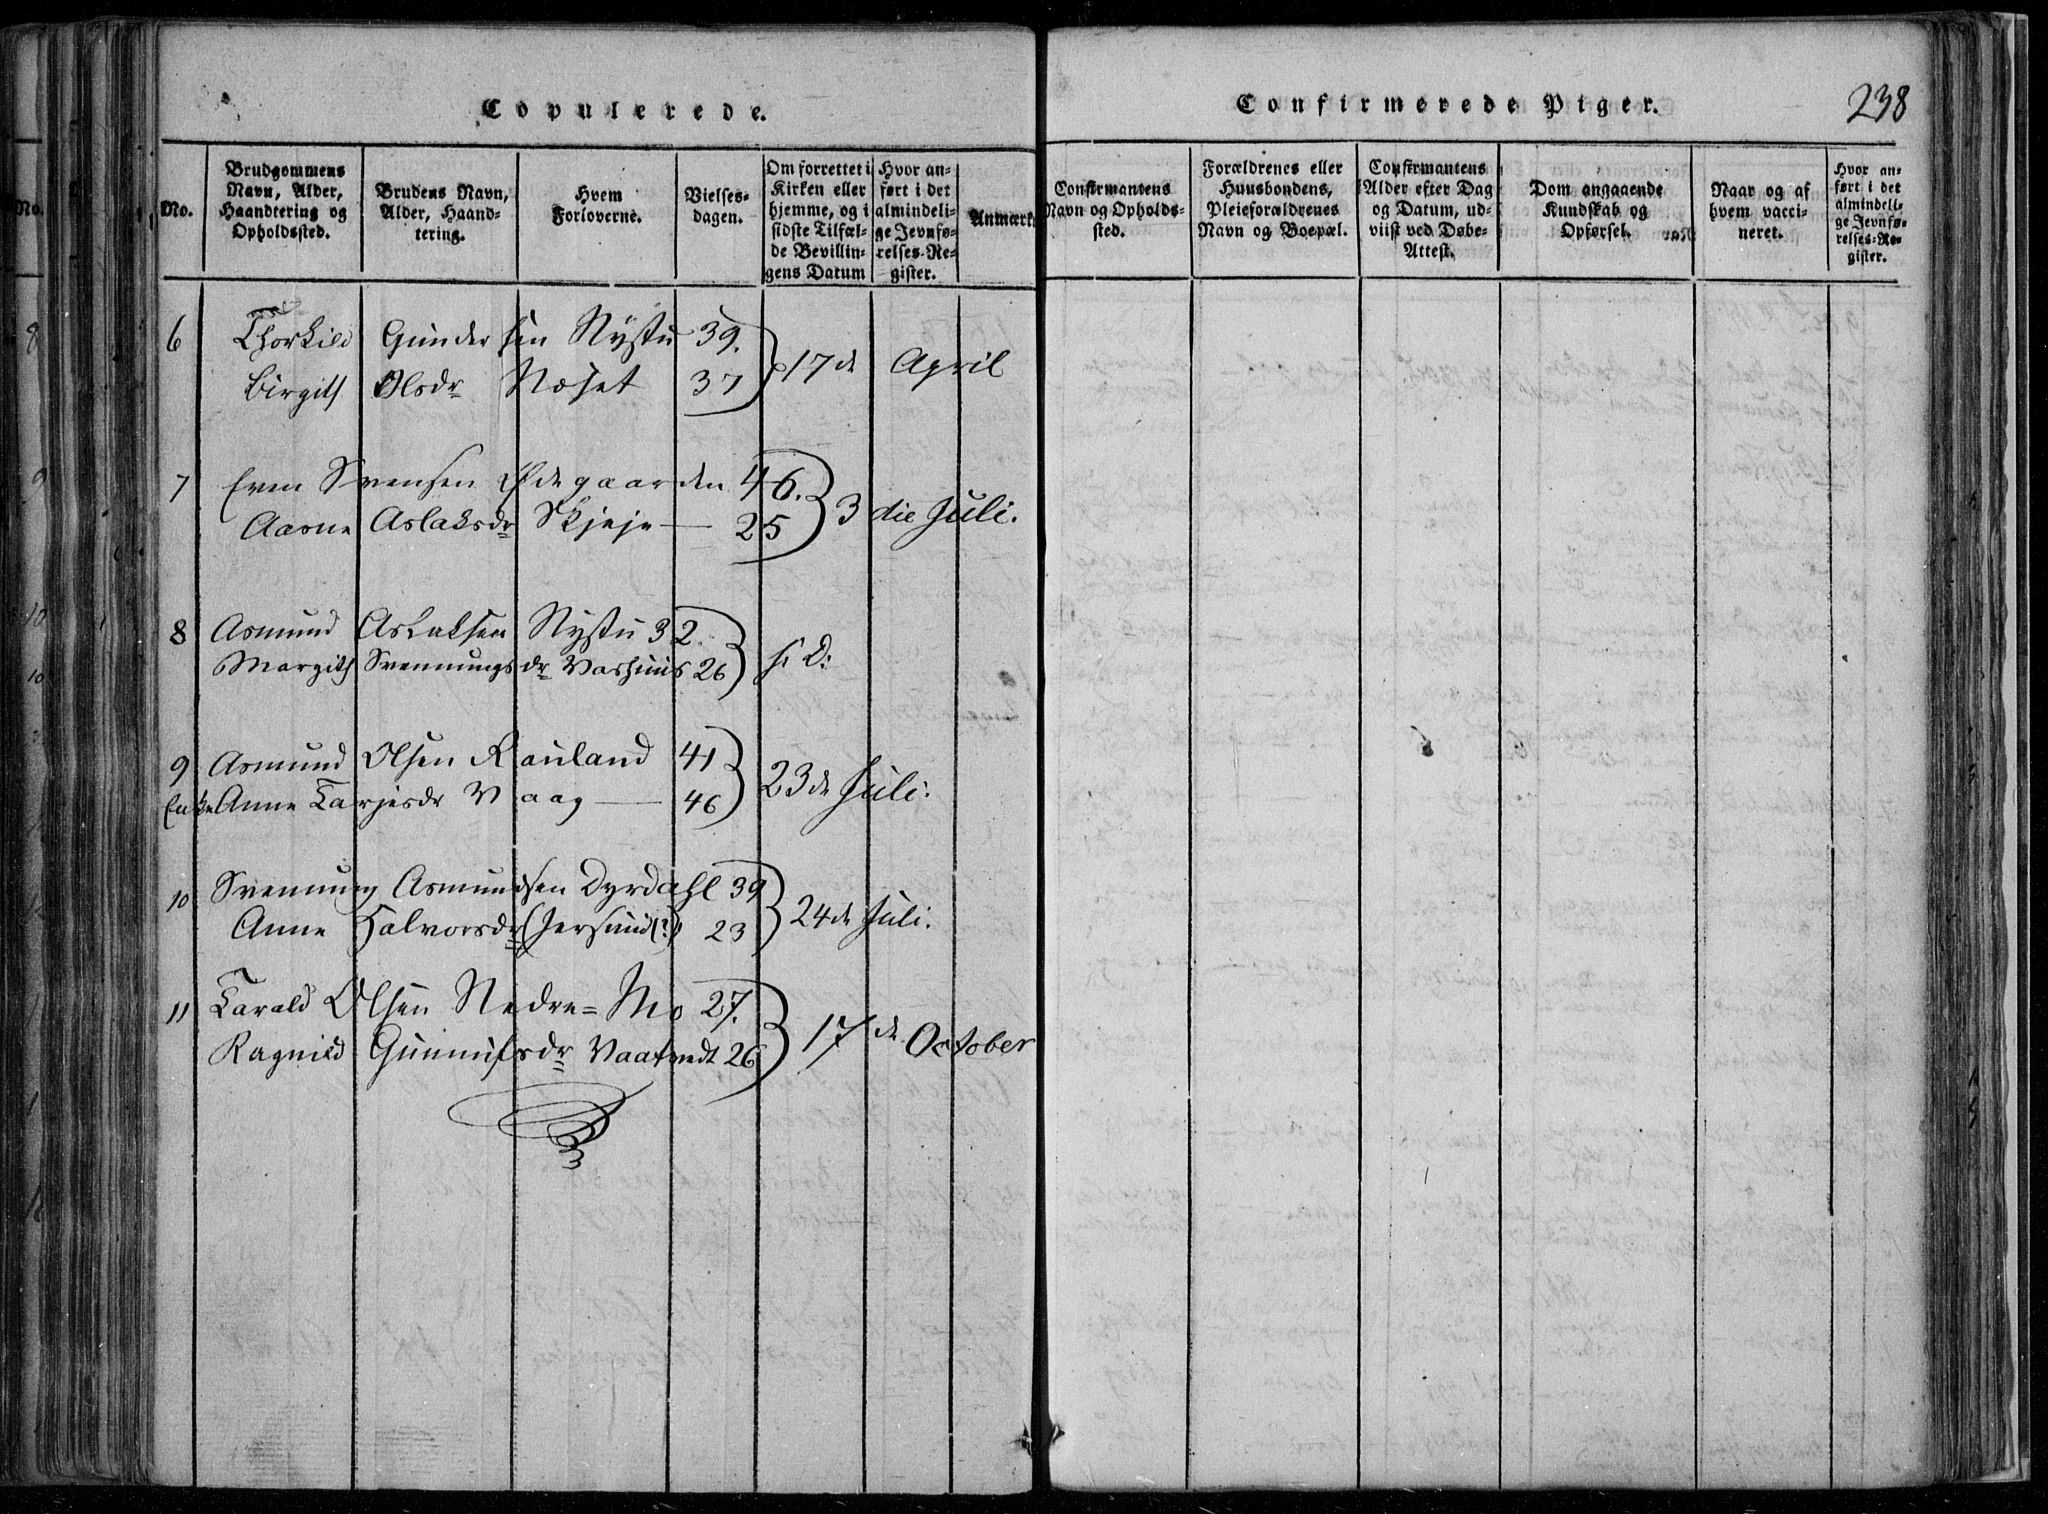 SAKO, Rauland kirkebøker, F/Fa/L0001: Ministerialbok nr. 1, 1814-1859, s. 238